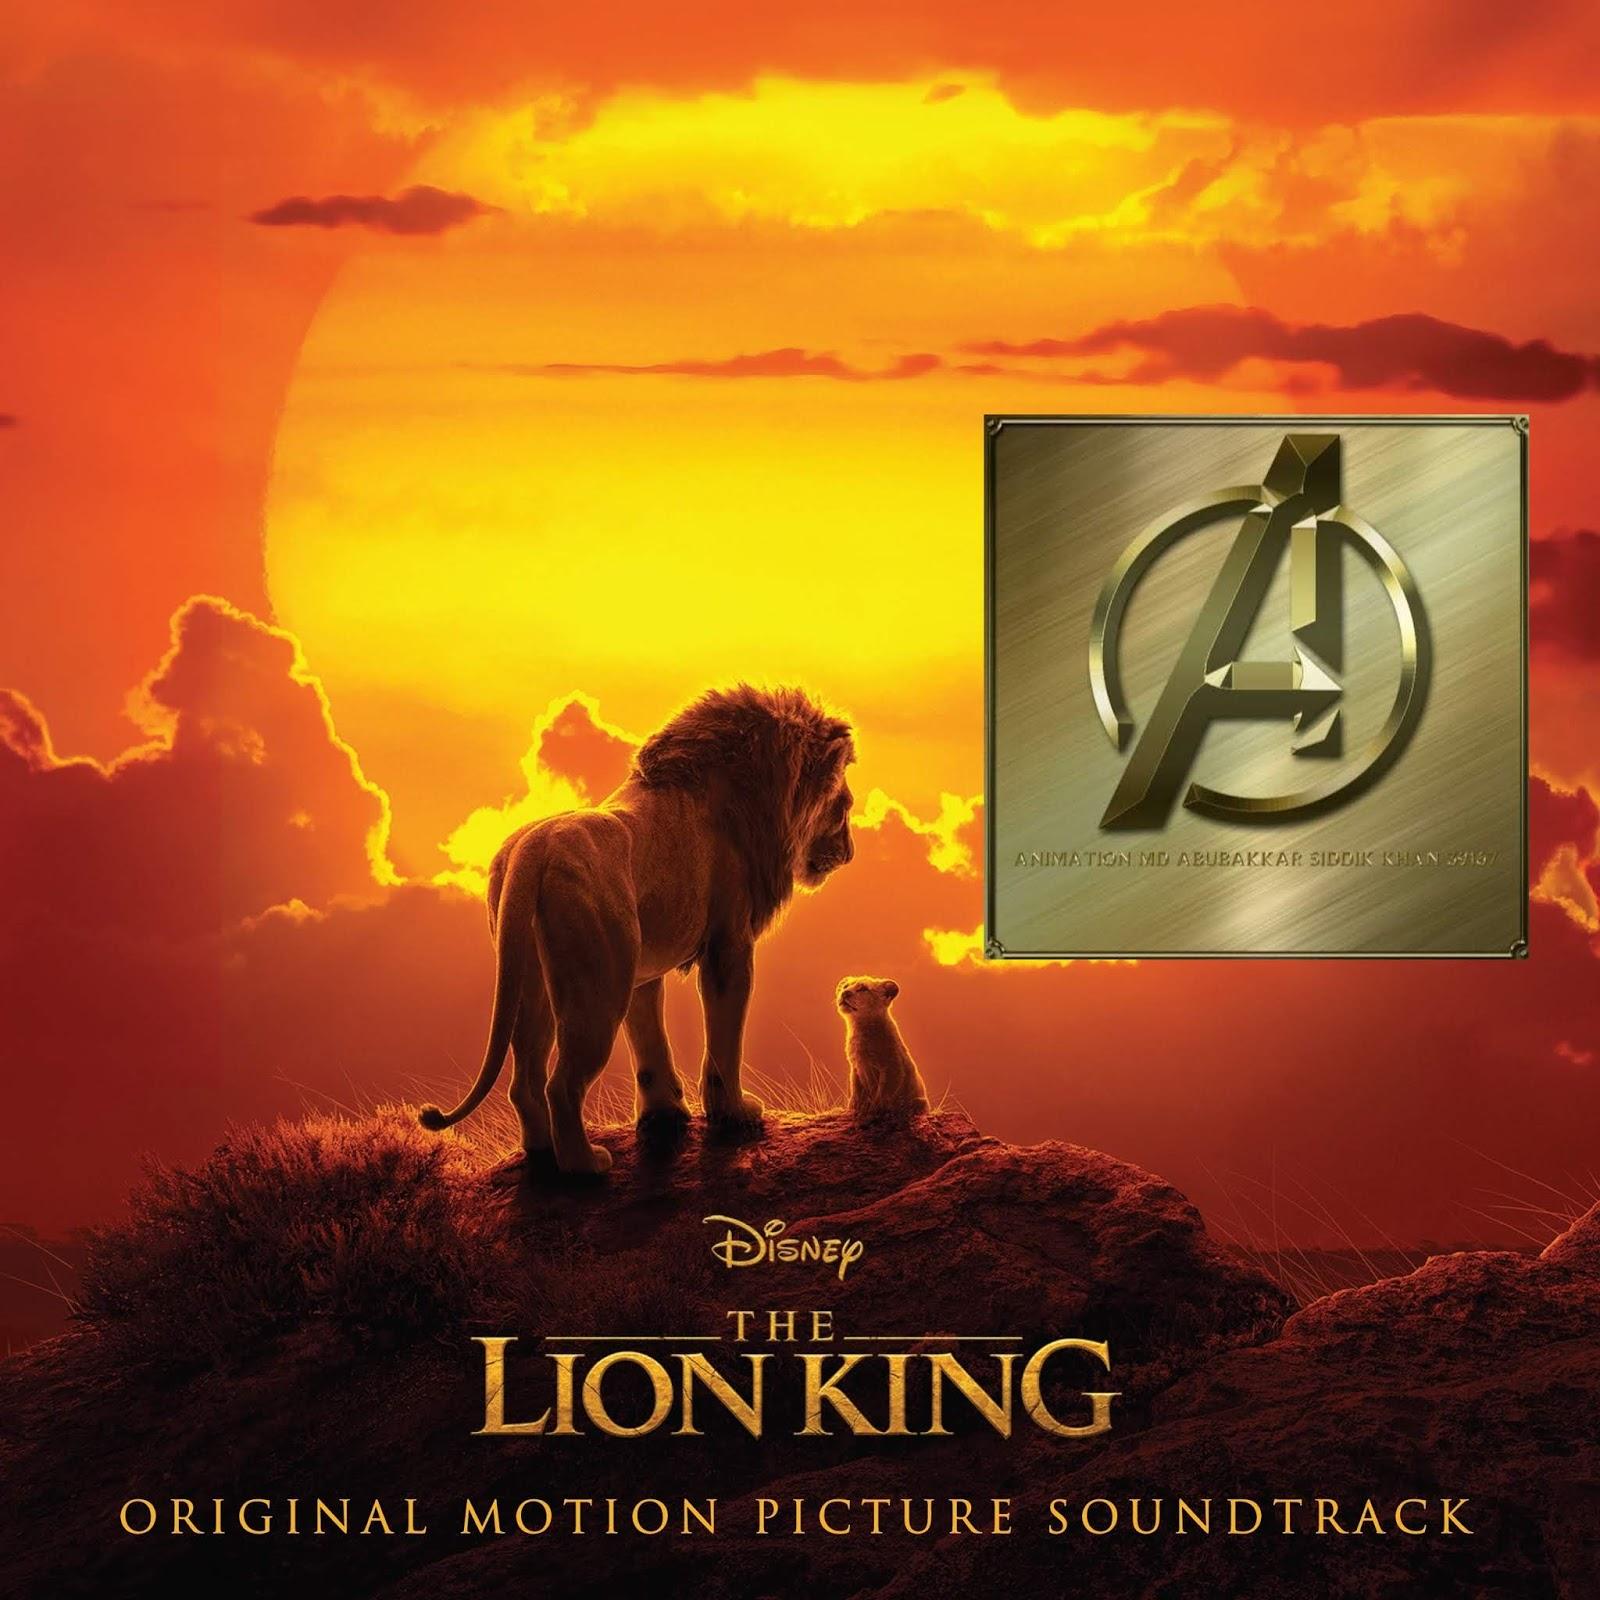 The Lion King (2019) Hindi Dubbed Full Movie Watch Online HD Print Free Download   ANIMATIONMDABUBAKKARSIDDIKKHAN.39167